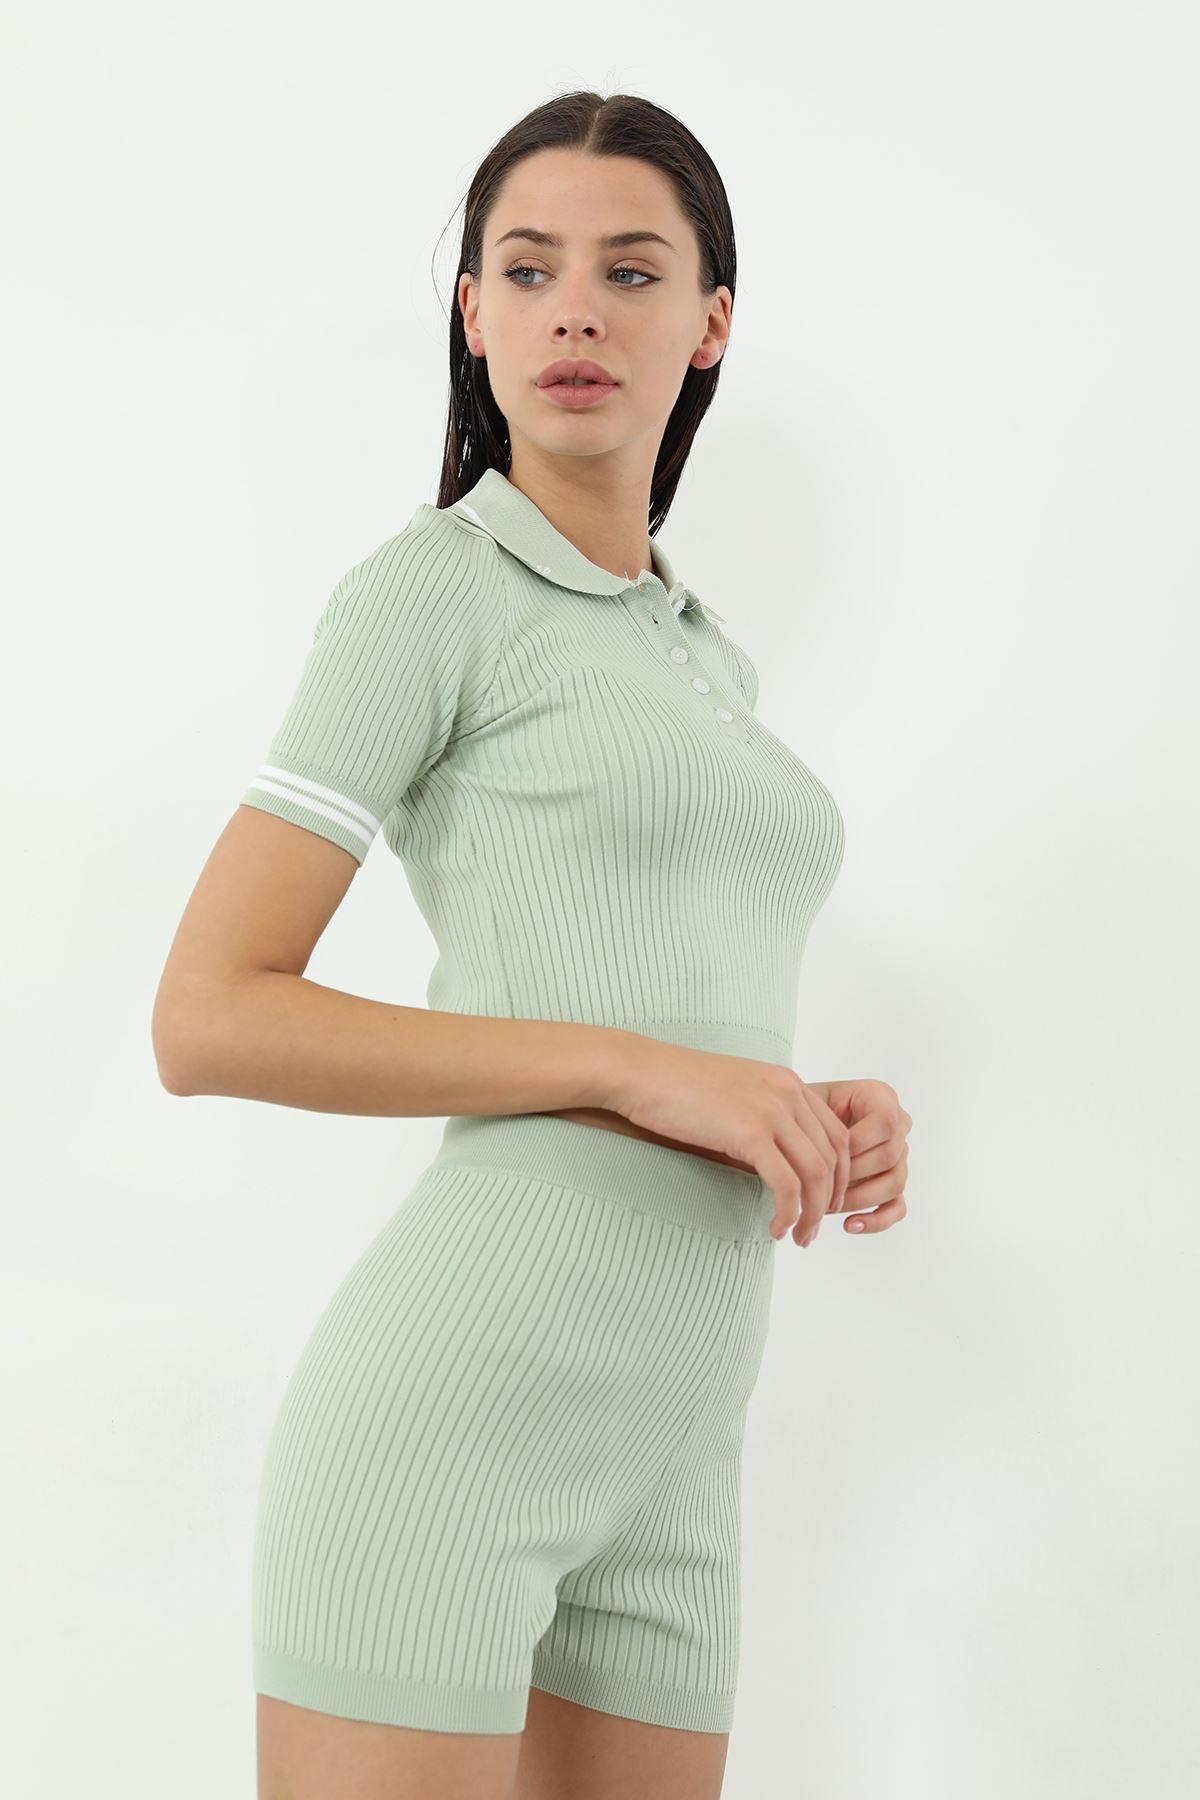 Polo Yaka Şortlu Takım-Mint